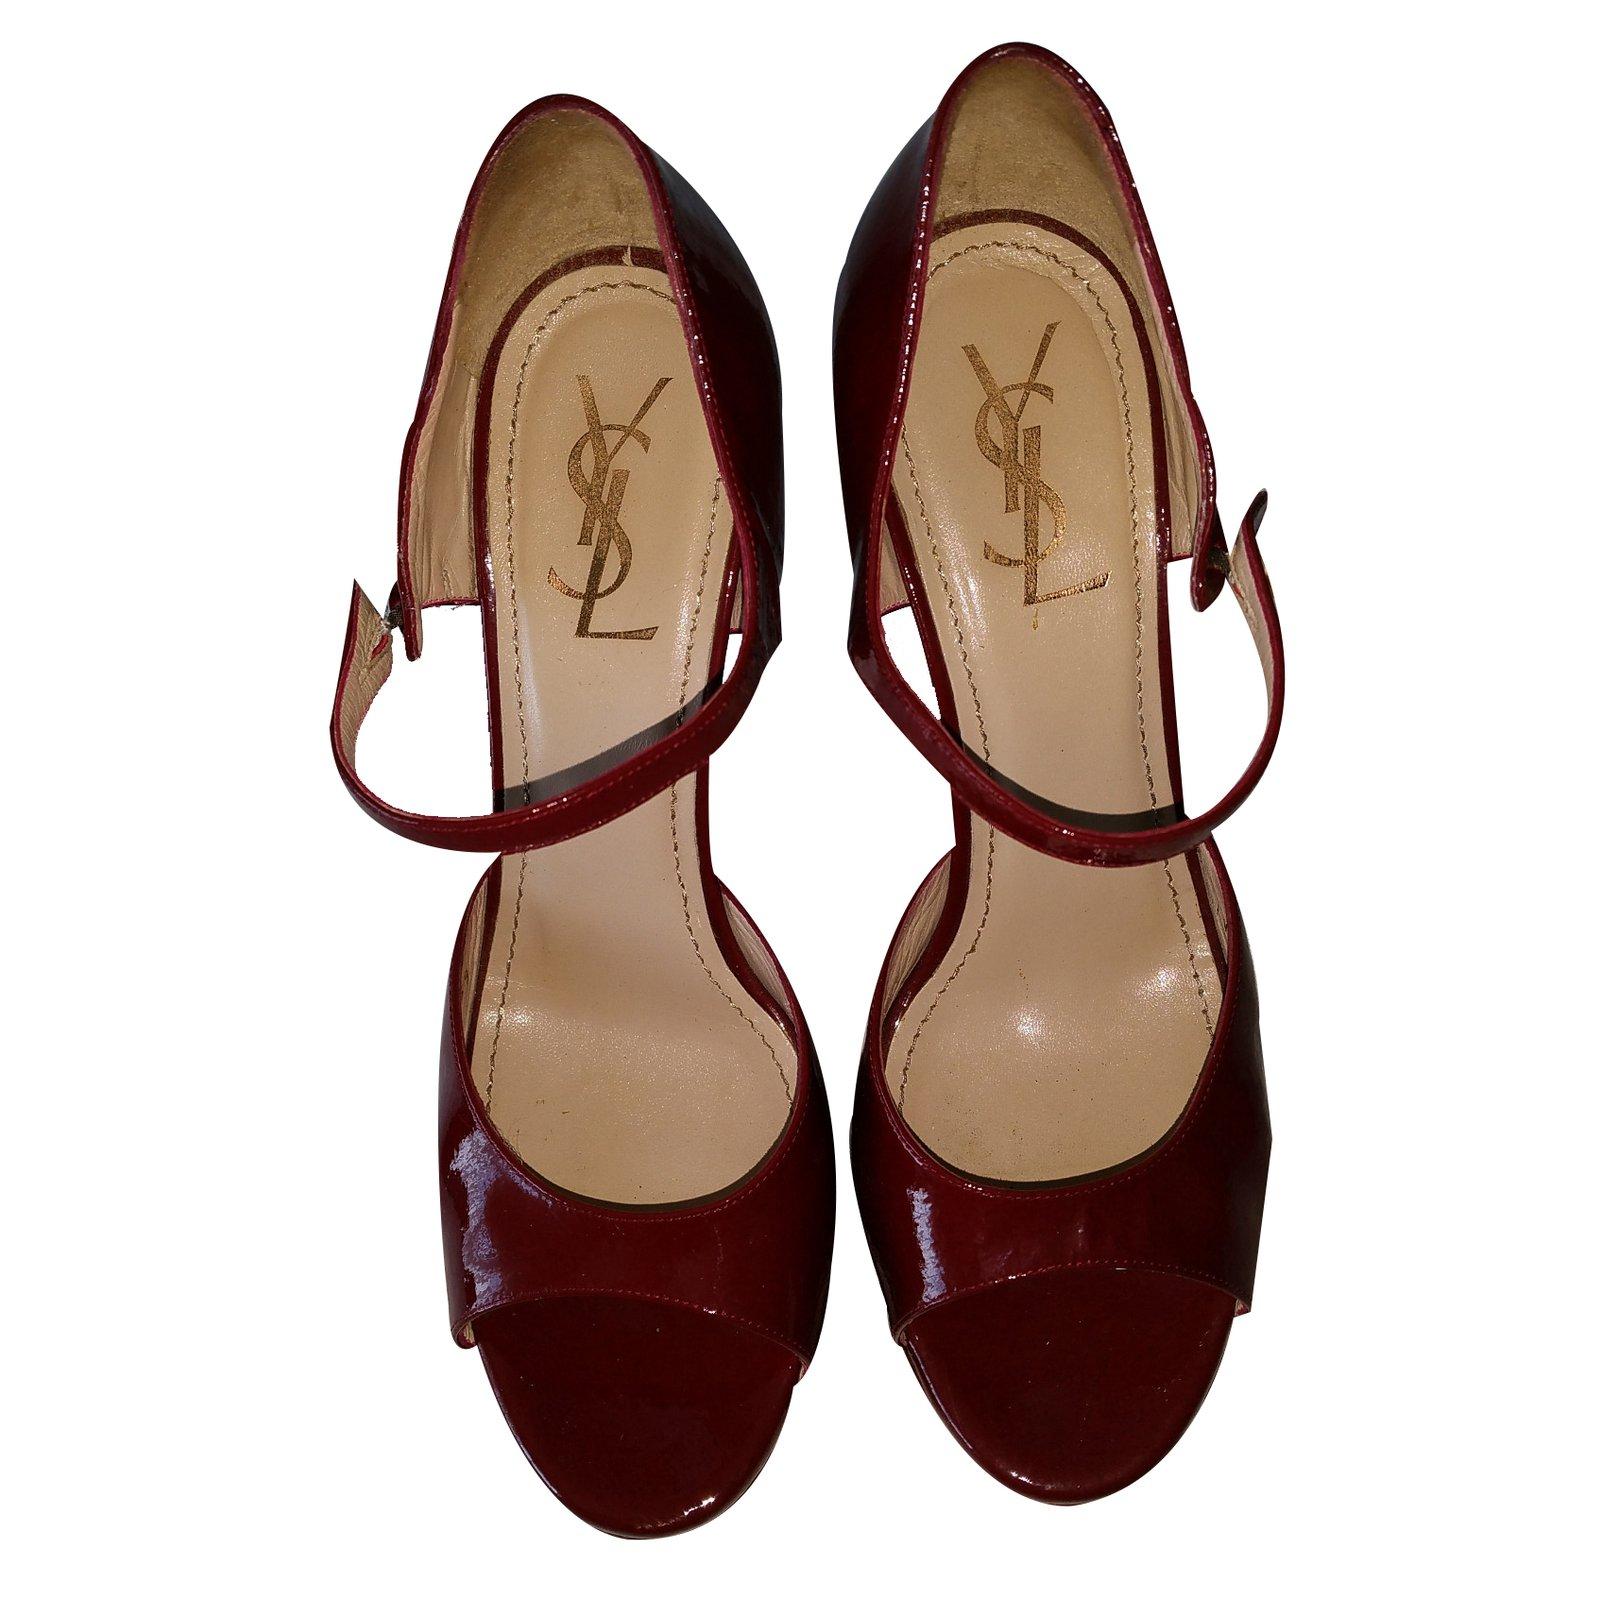 4aba08b8e442d Yves Saint Laurent Heels Heels Patent leather Dark red ref.20112 ...